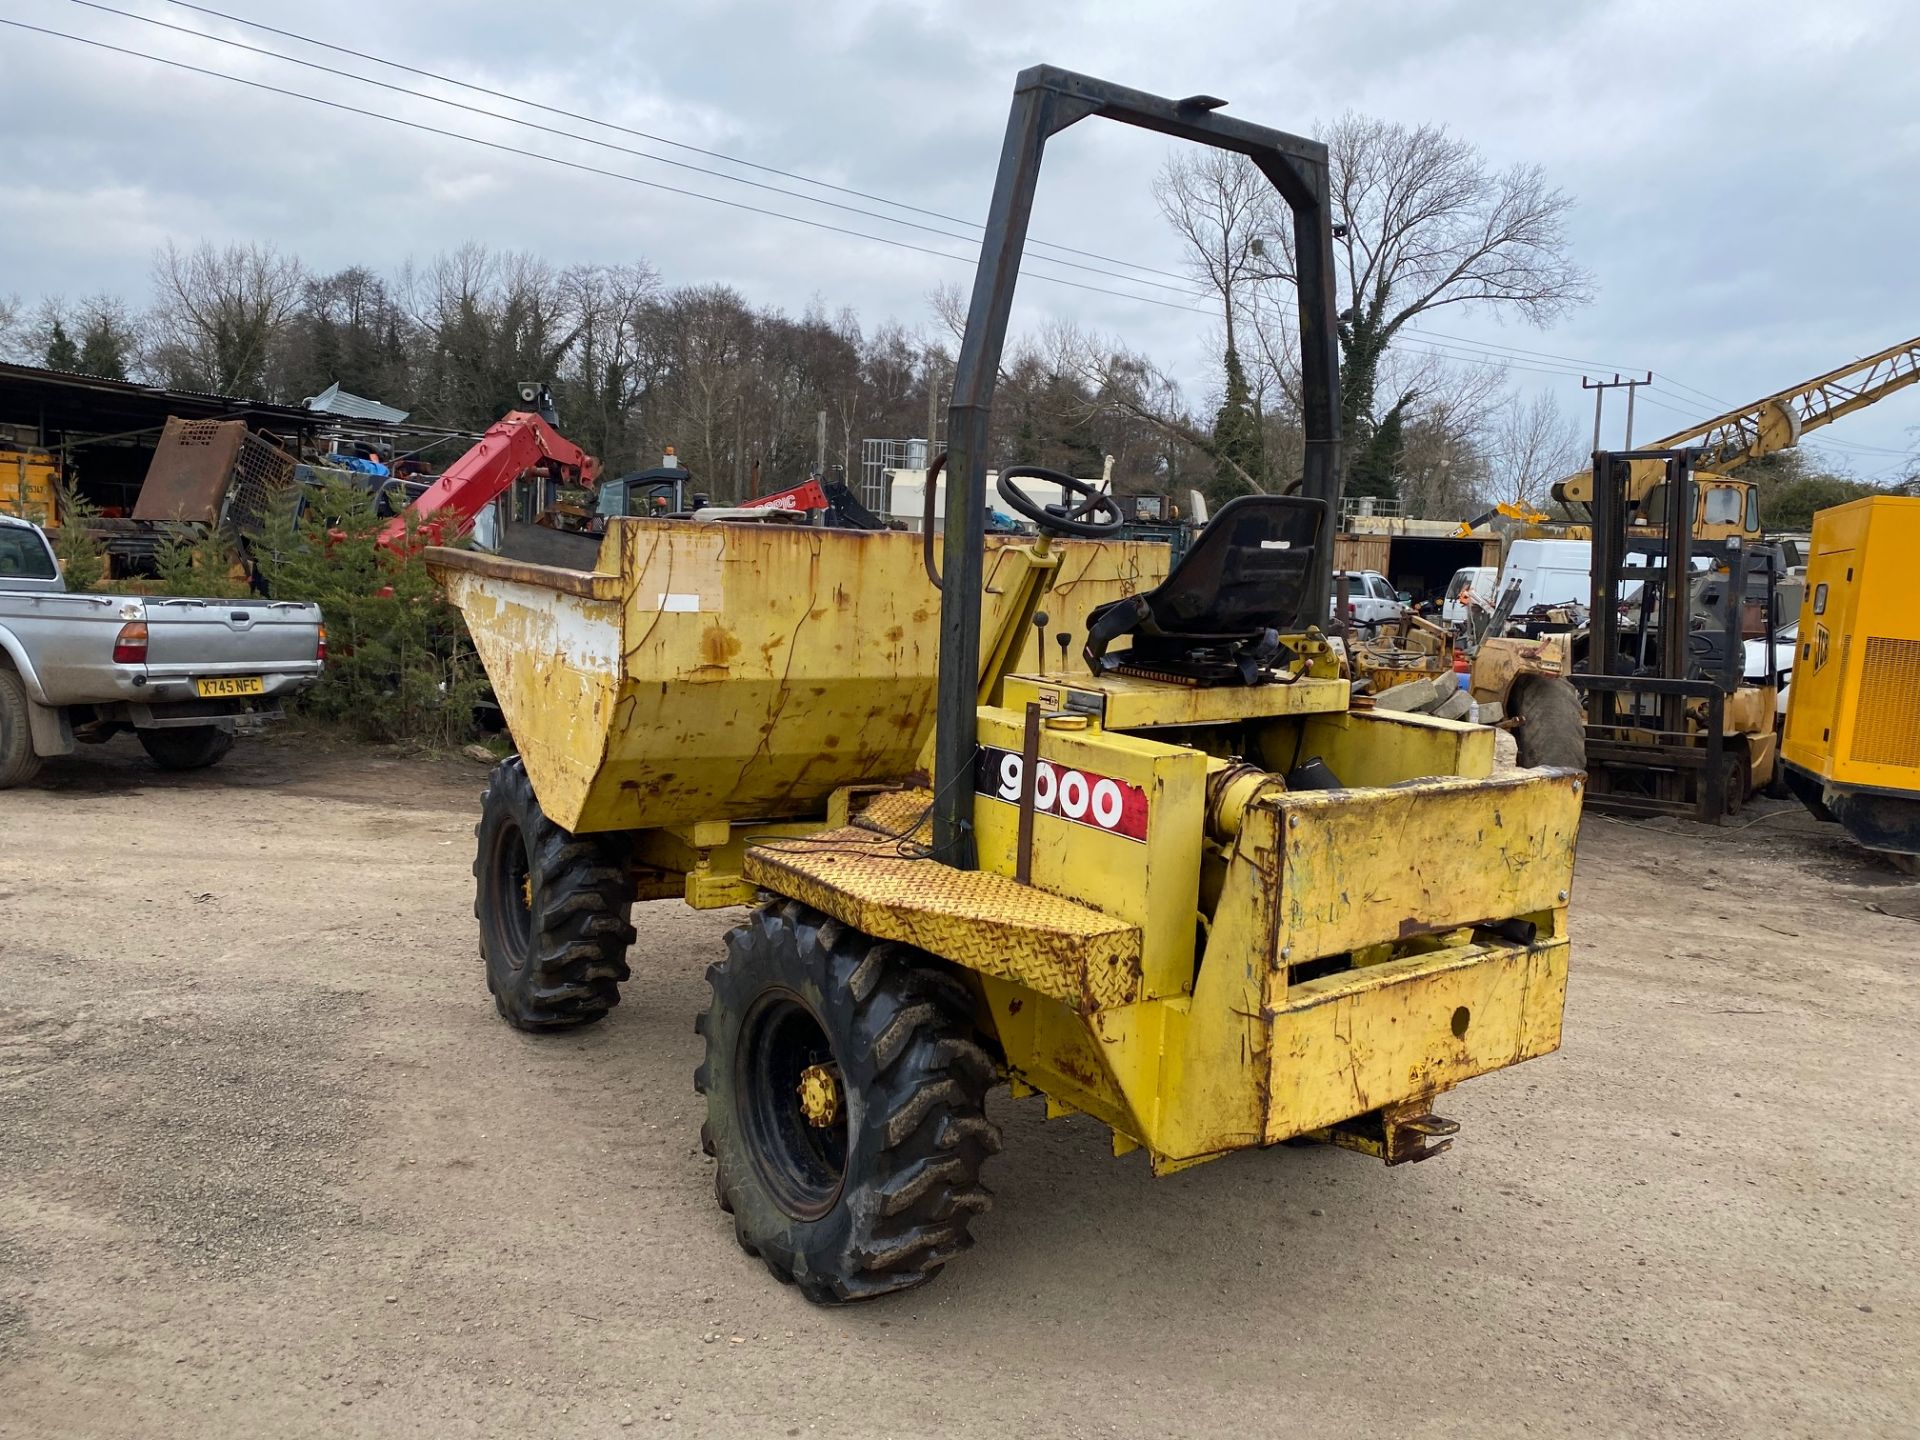 Thwaites 4 ton dumper, 4x4, electric start, Roll bar, 3 cylinder Lister Petter engine - Image 3 of 5